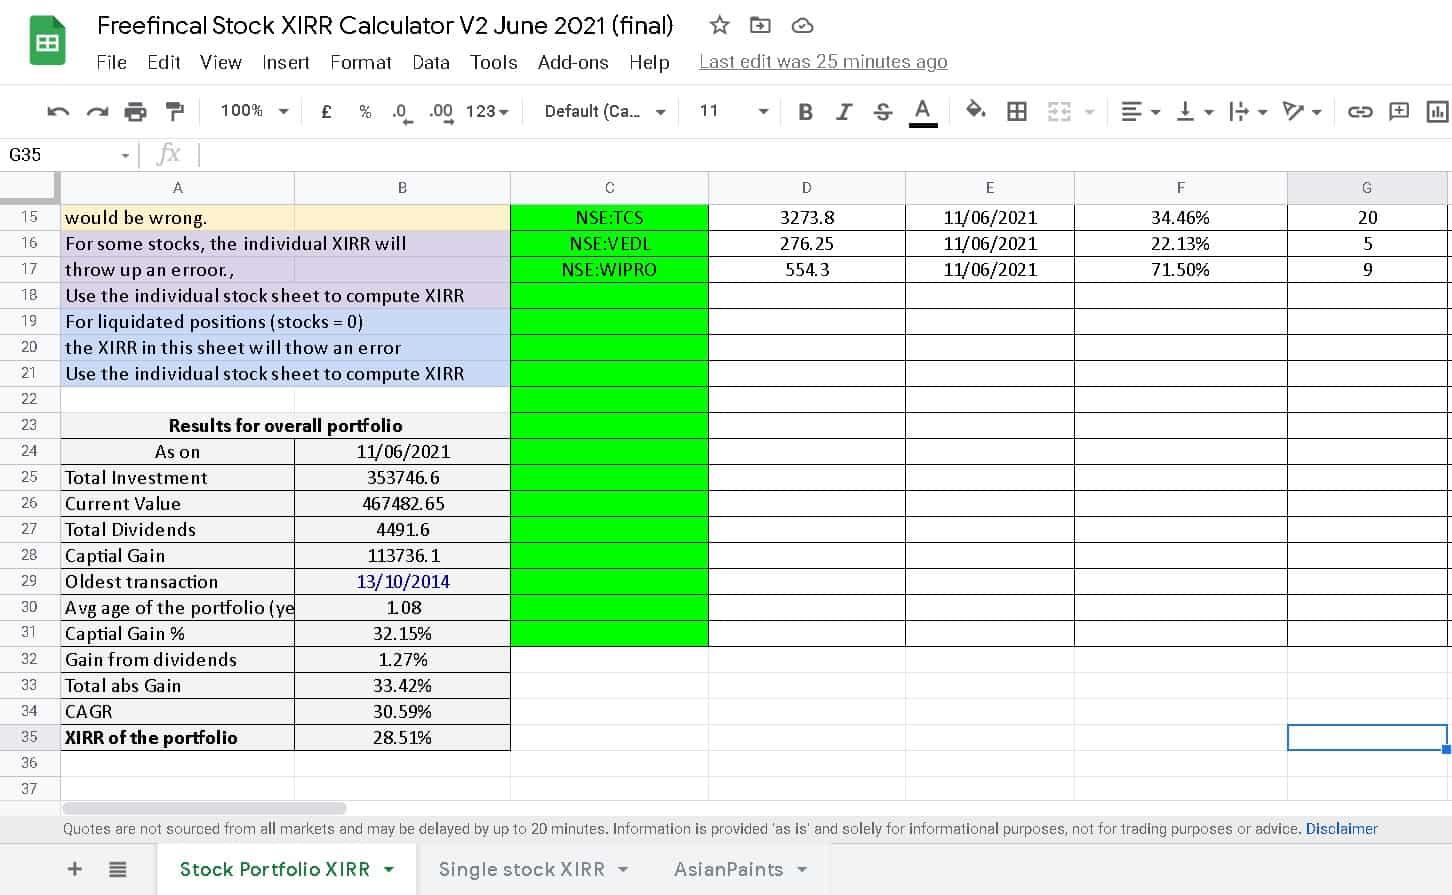 Freefincal stock XIRR calculator showing the overall portfolio XIRR results